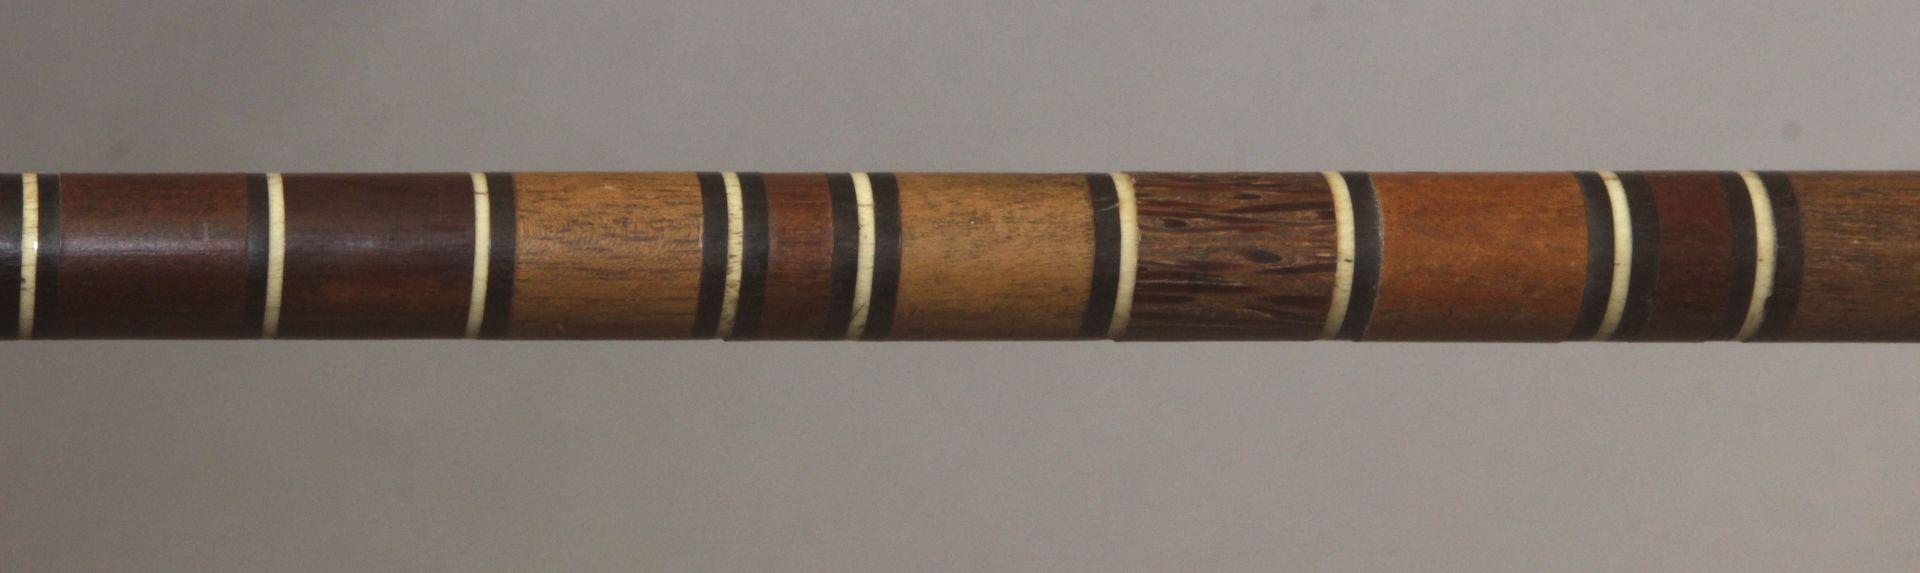 A 20th century wood, horn and bone sample walking cane - Bild 7 aus 7